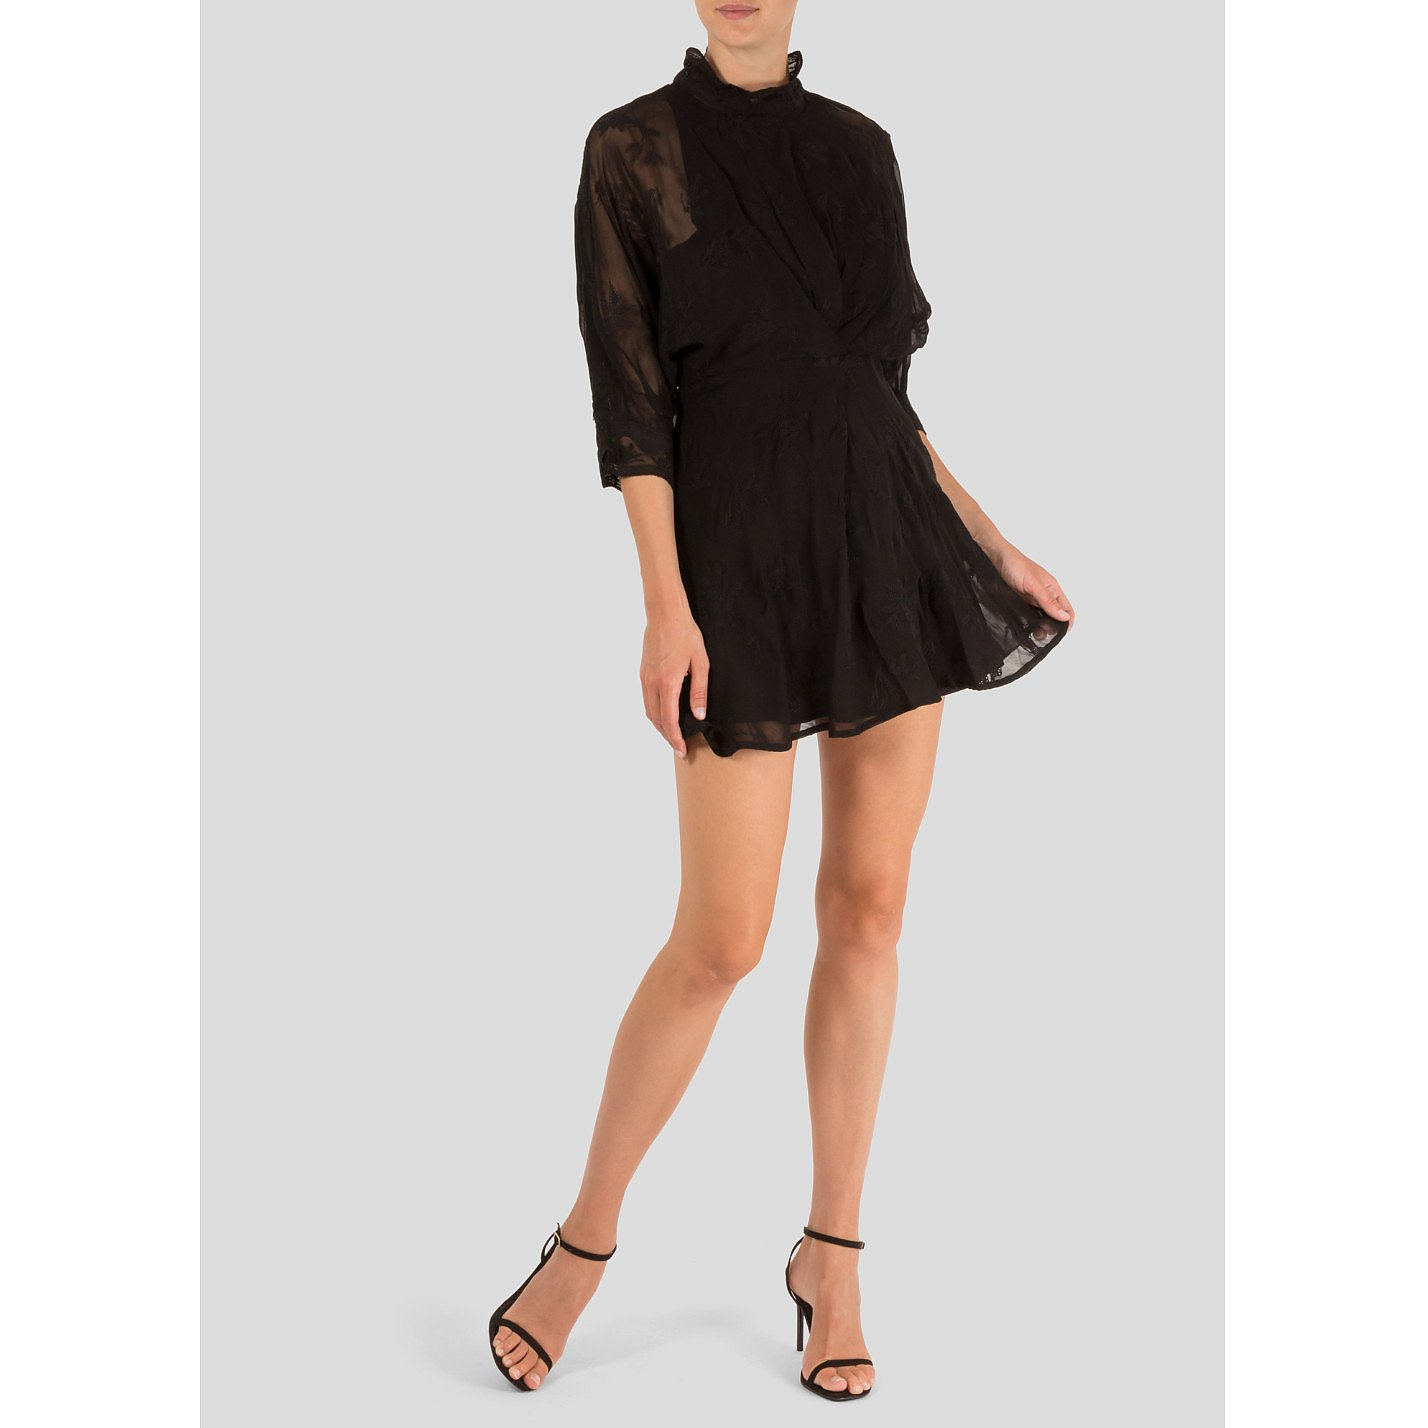 IRO Leine Dress